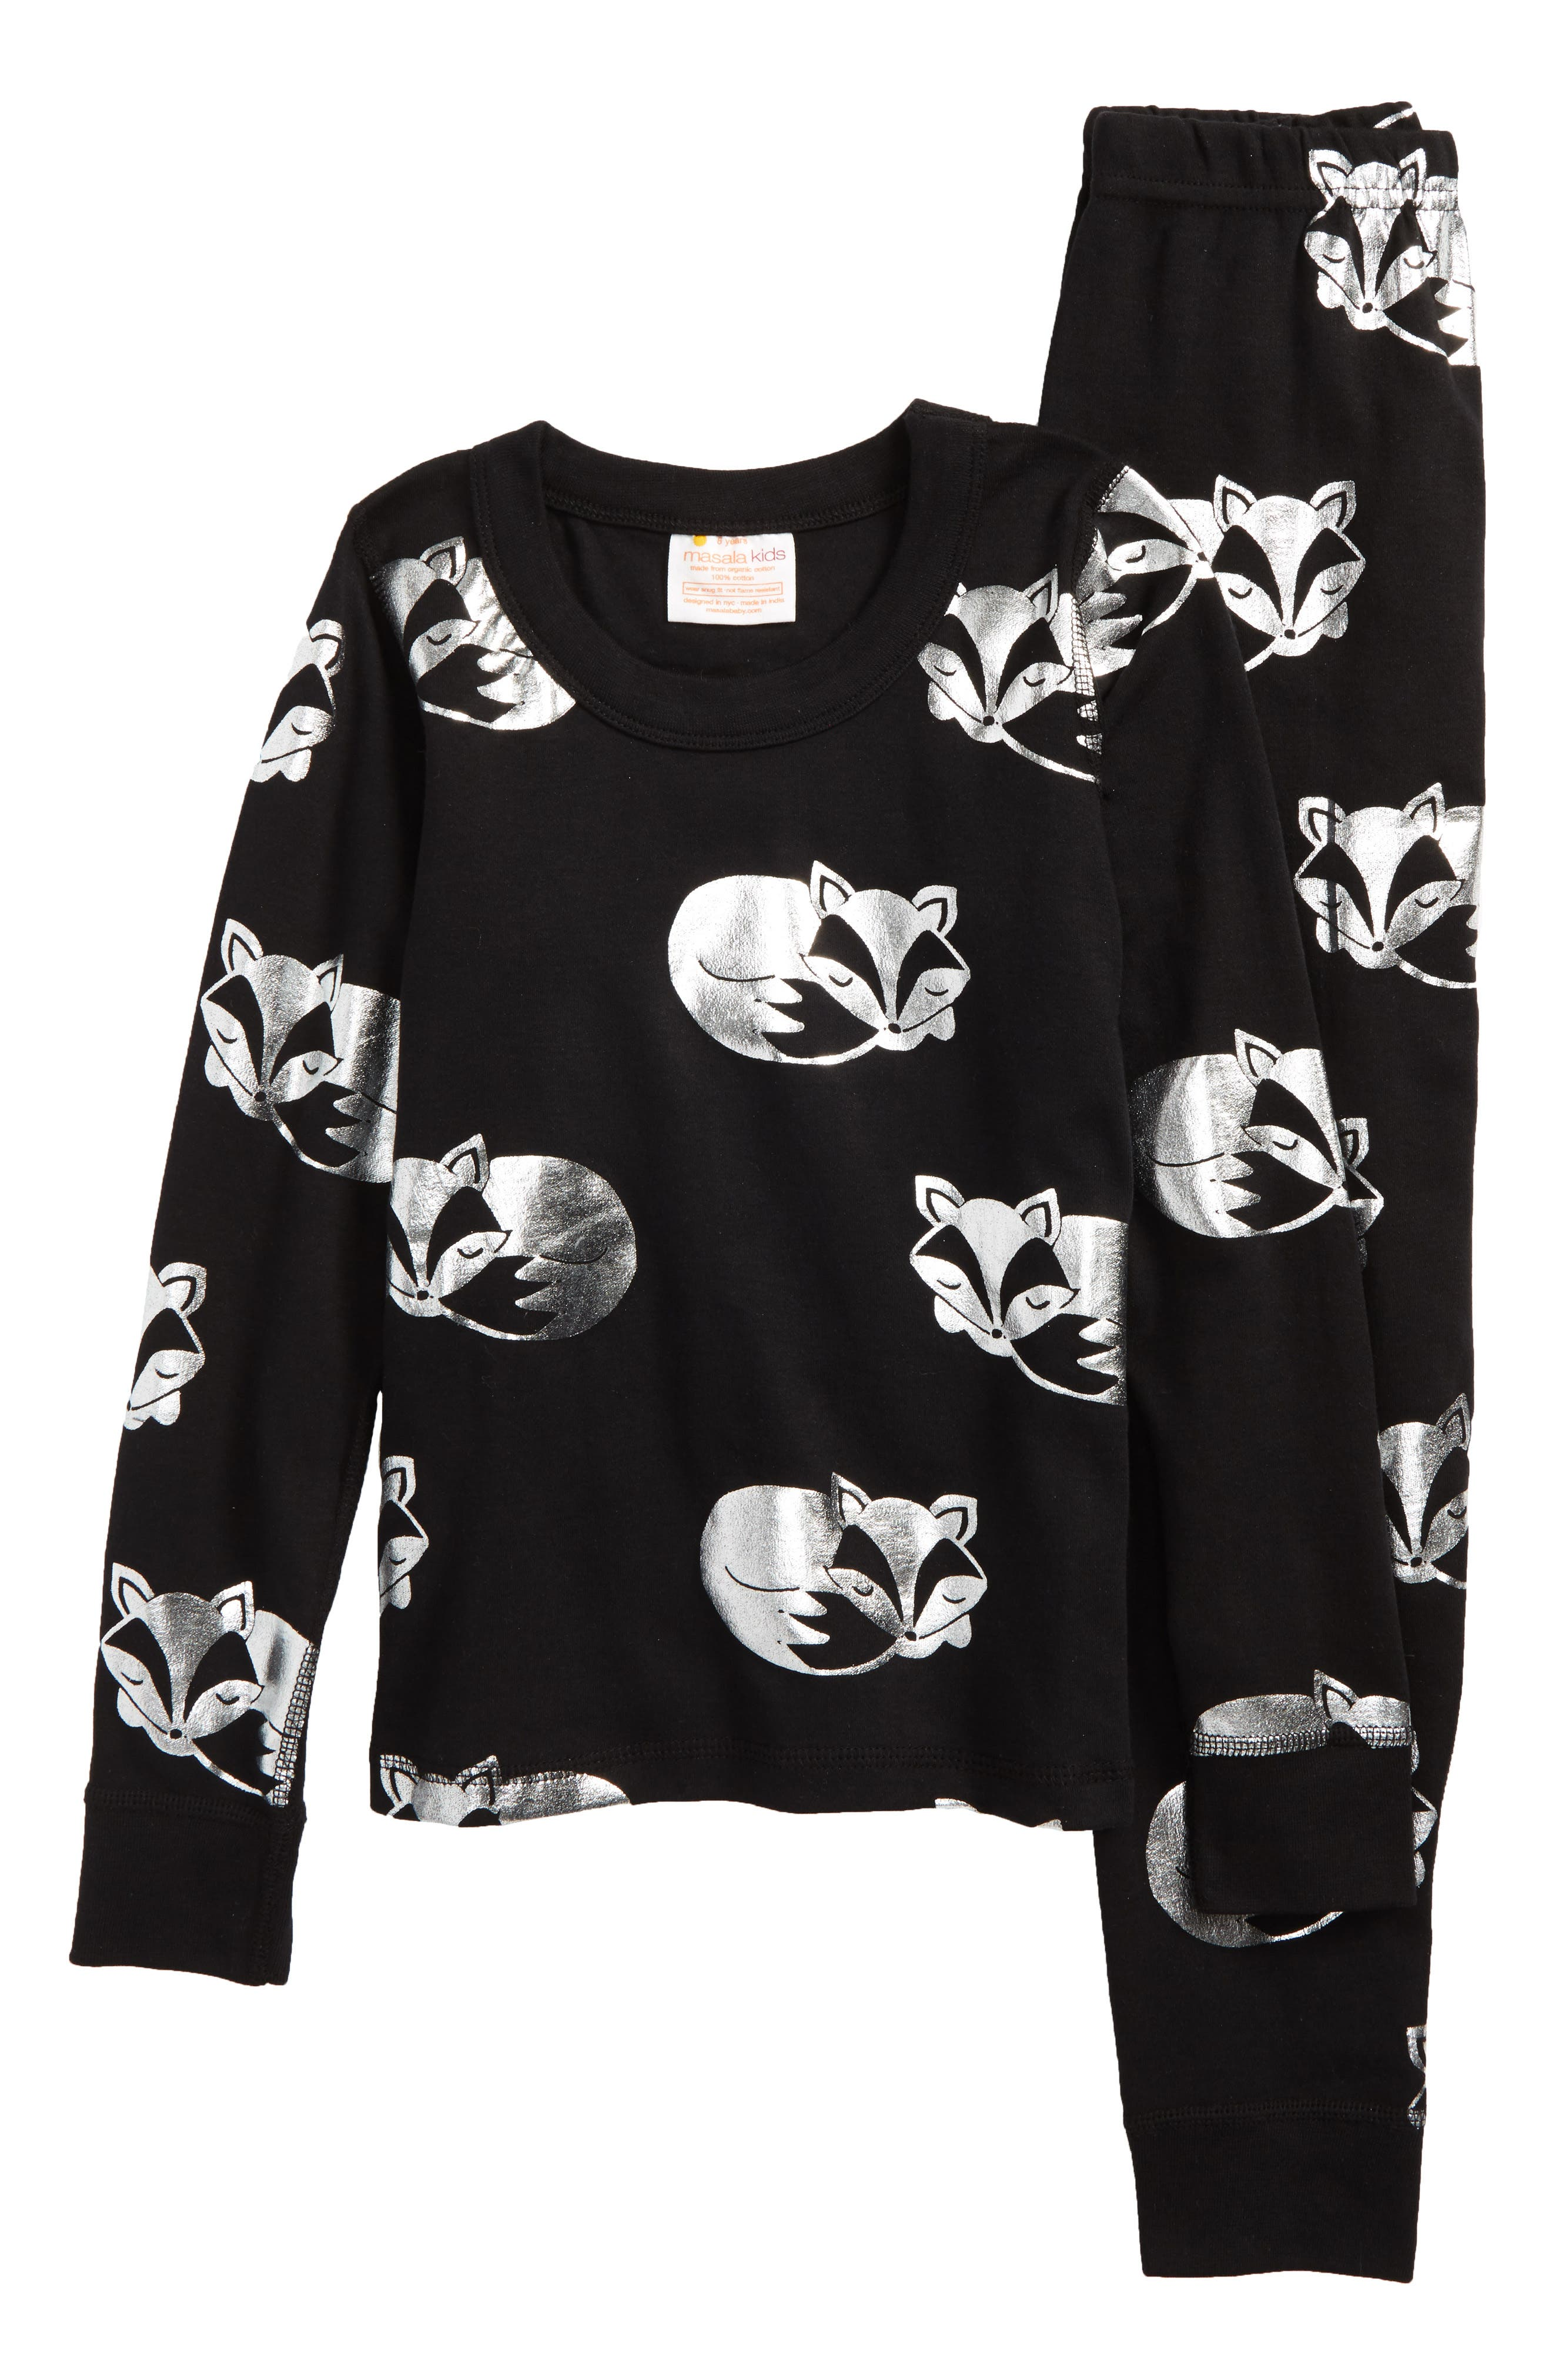 Alternate Image 1 Selected - Masala Baby Sleeping Foxes Fitted Two-Piece Pajamas (Toddler Girls, Little Girls & Big Girls)